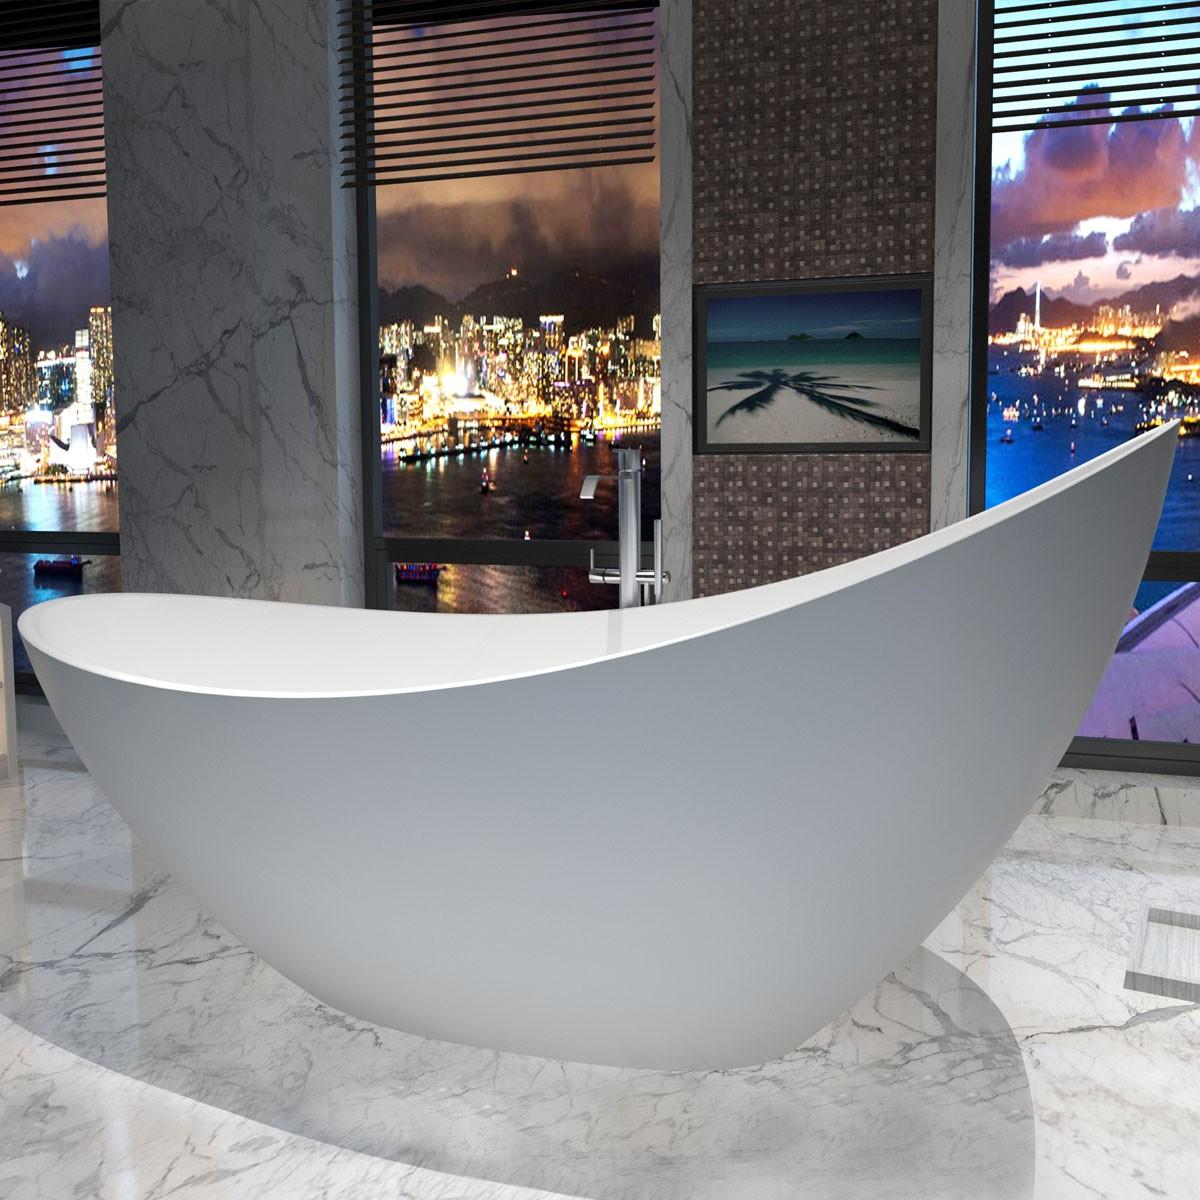 74 po baignoire autoportante en pierre de synth se blanc. Black Bedroom Furniture Sets. Home Design Ideas